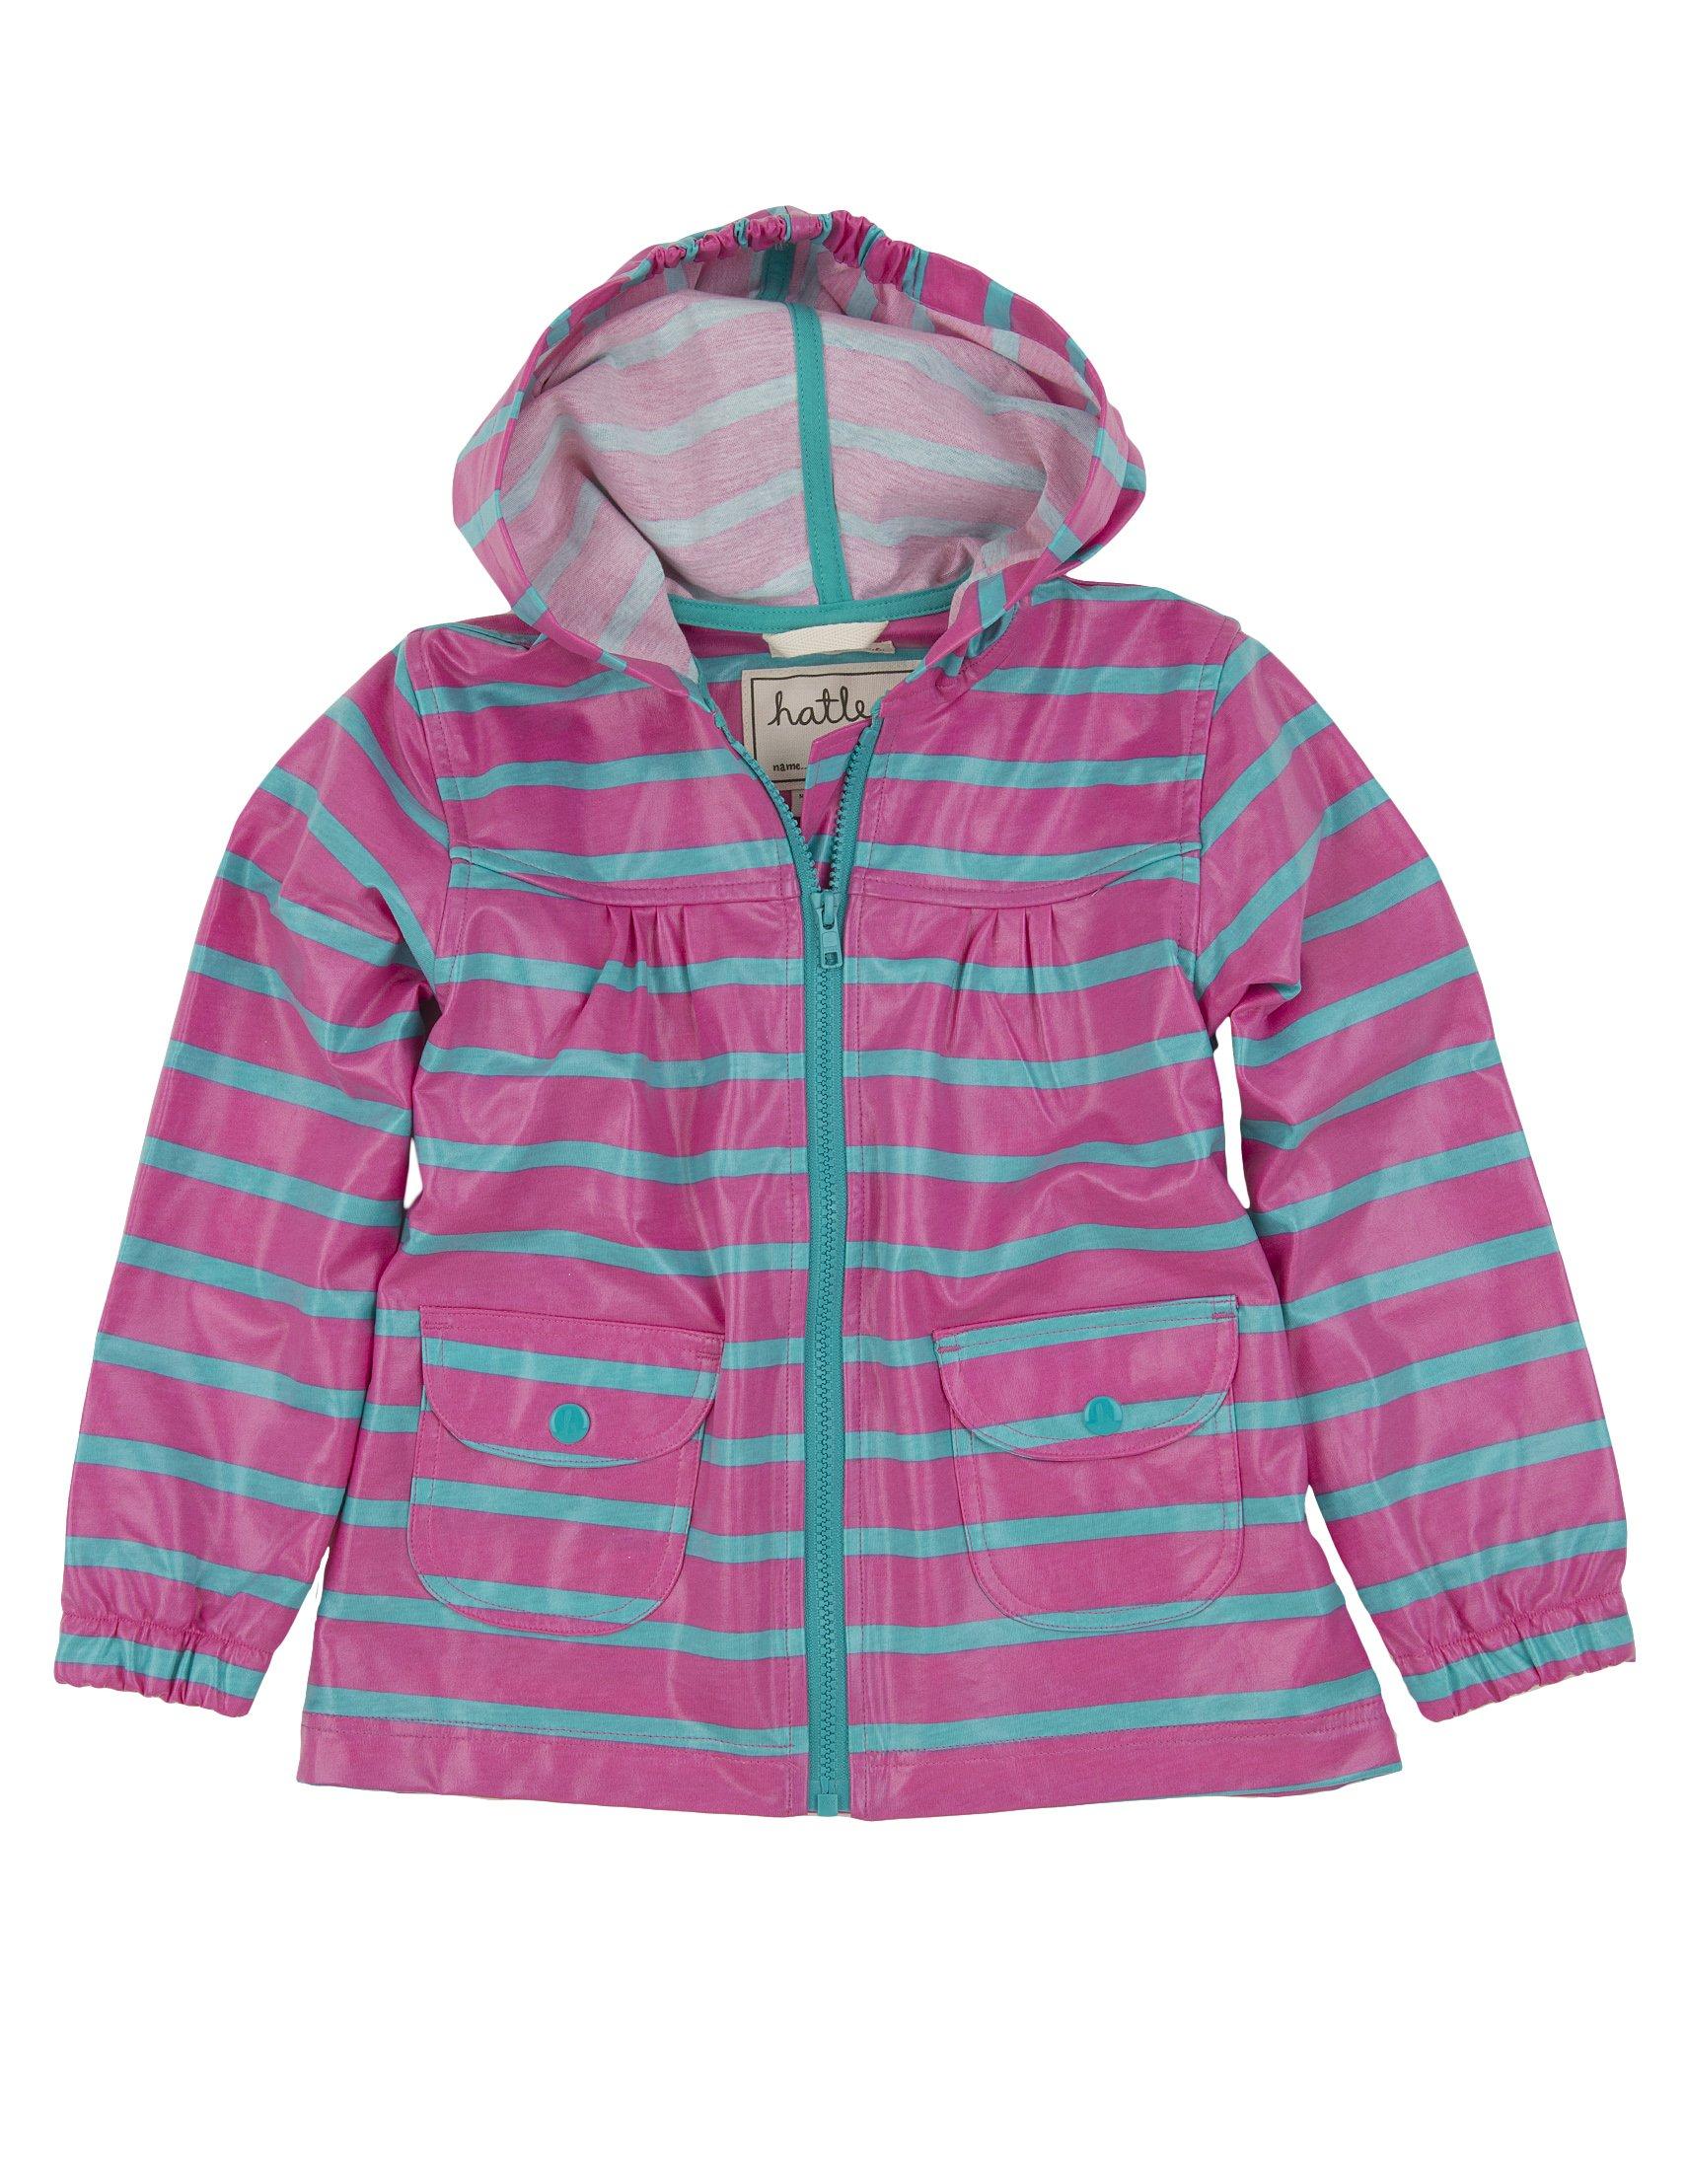 Hatley Little Girls' Unlined Stripes Raincoat, Pink Stripes, 5